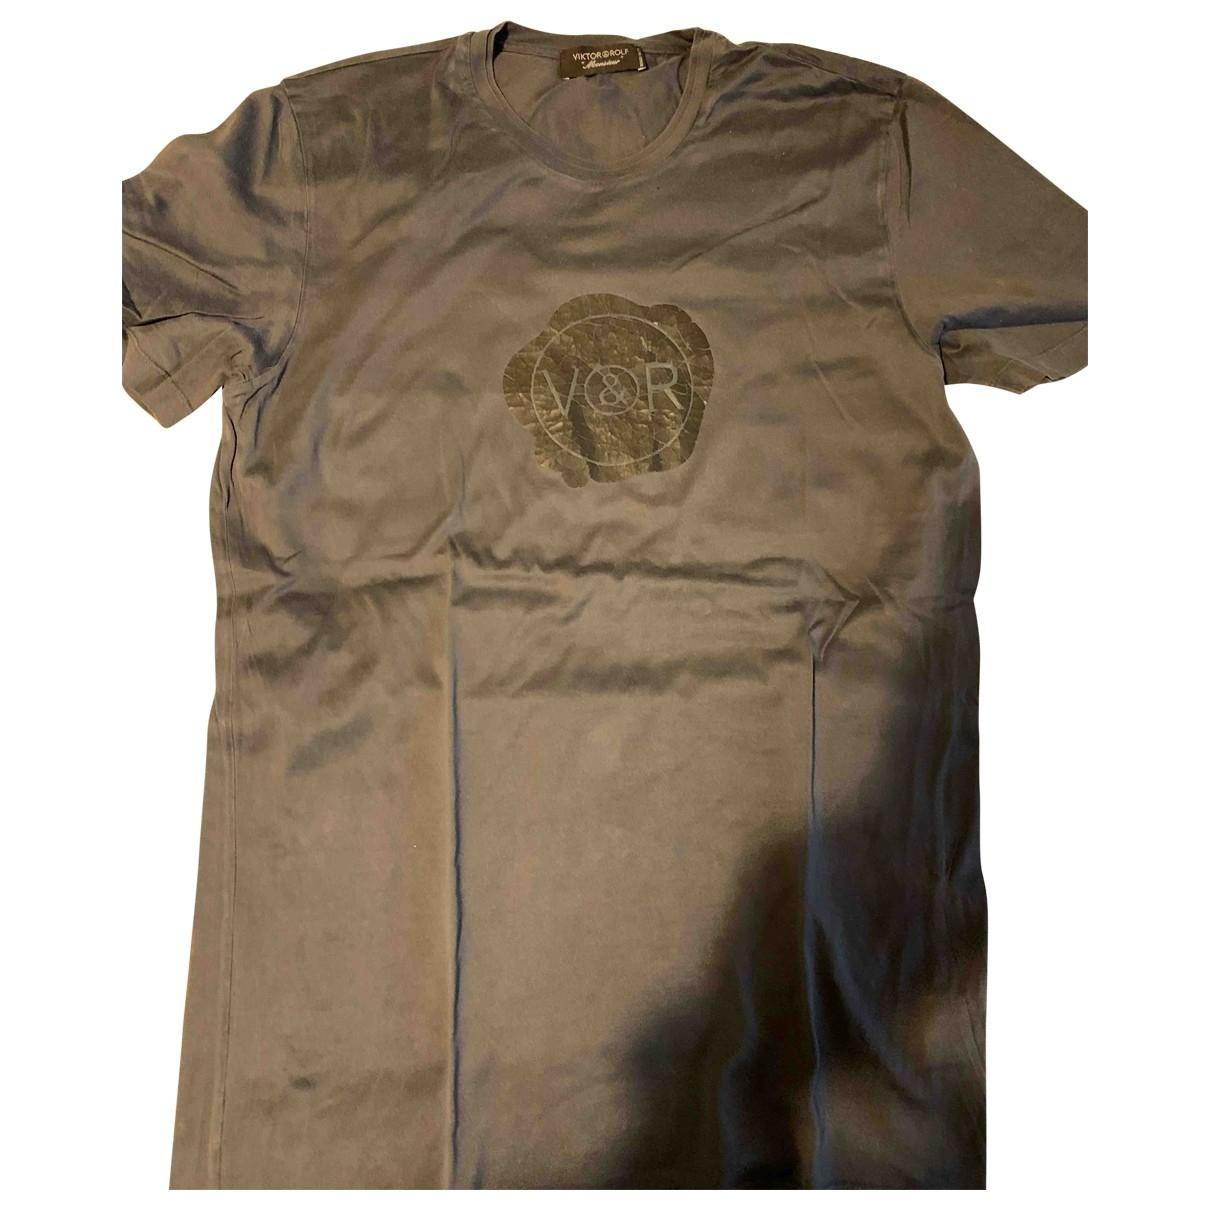 Viktor & Rolf - Tee shirts   pour homme en coton - anthracite